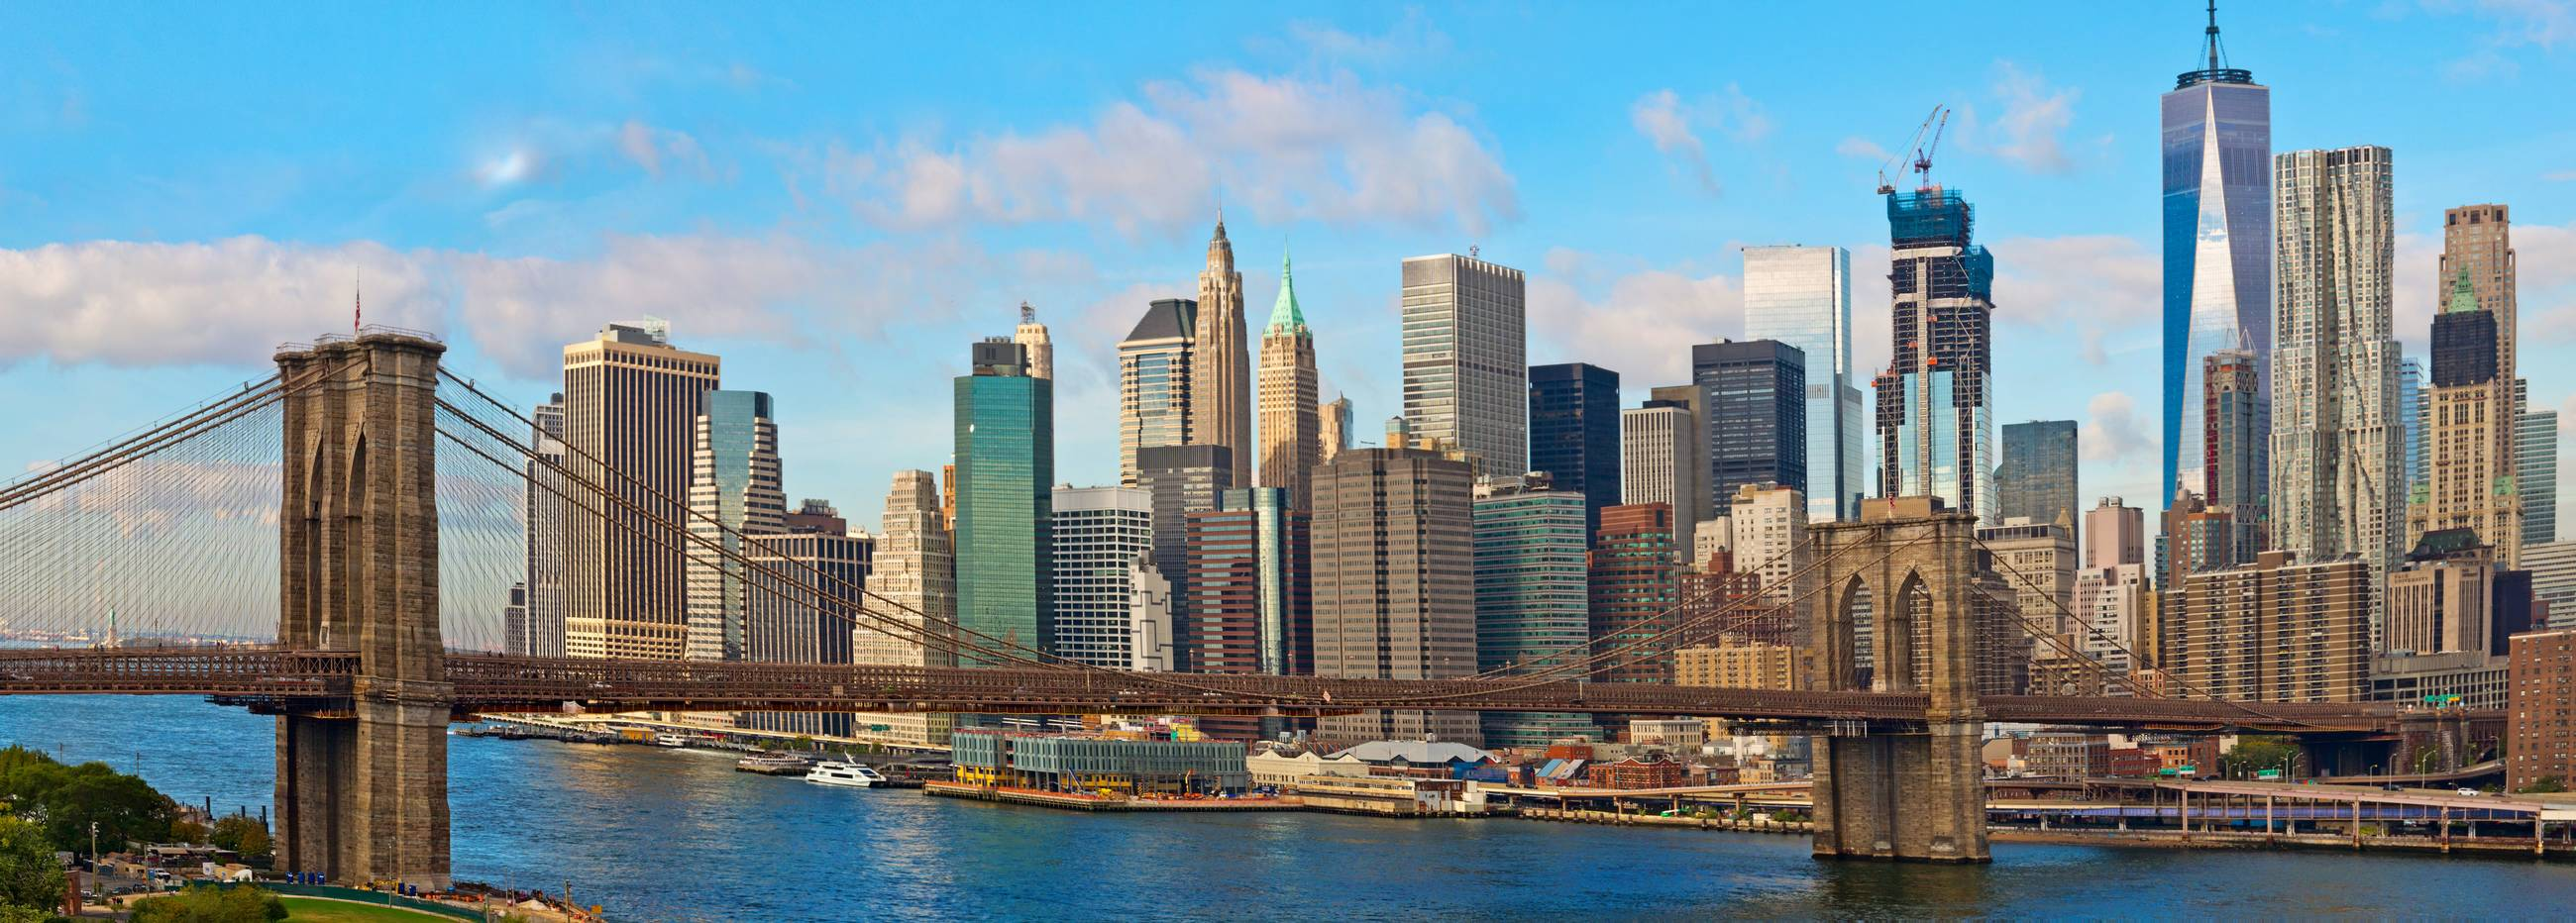 new york insider tips-live-like-local-hero